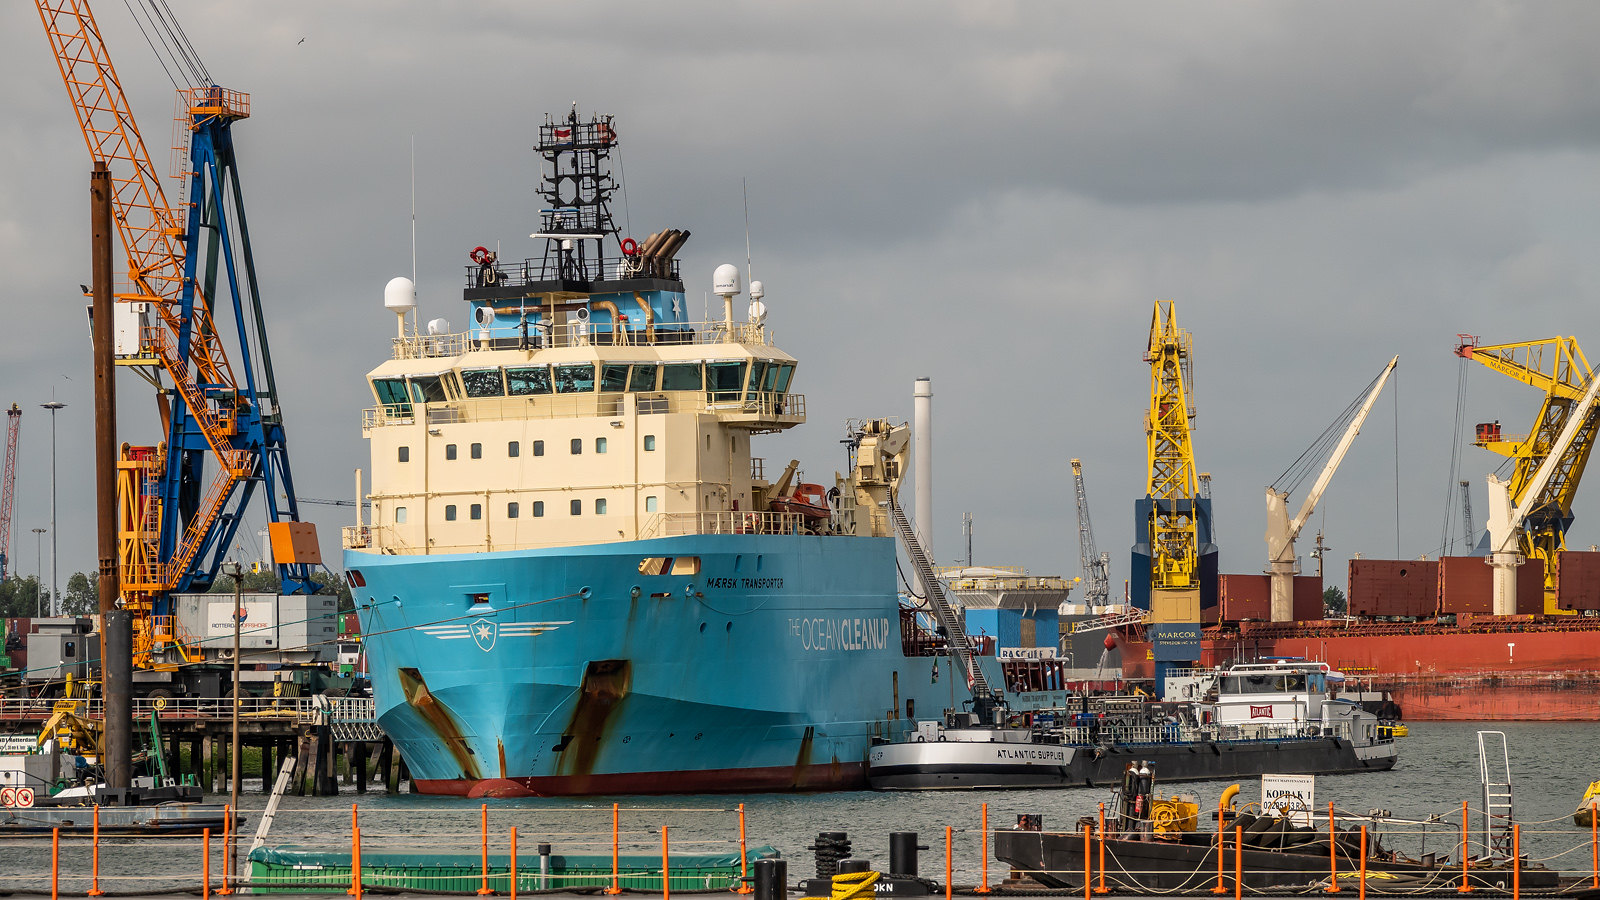 Maersk Transporter